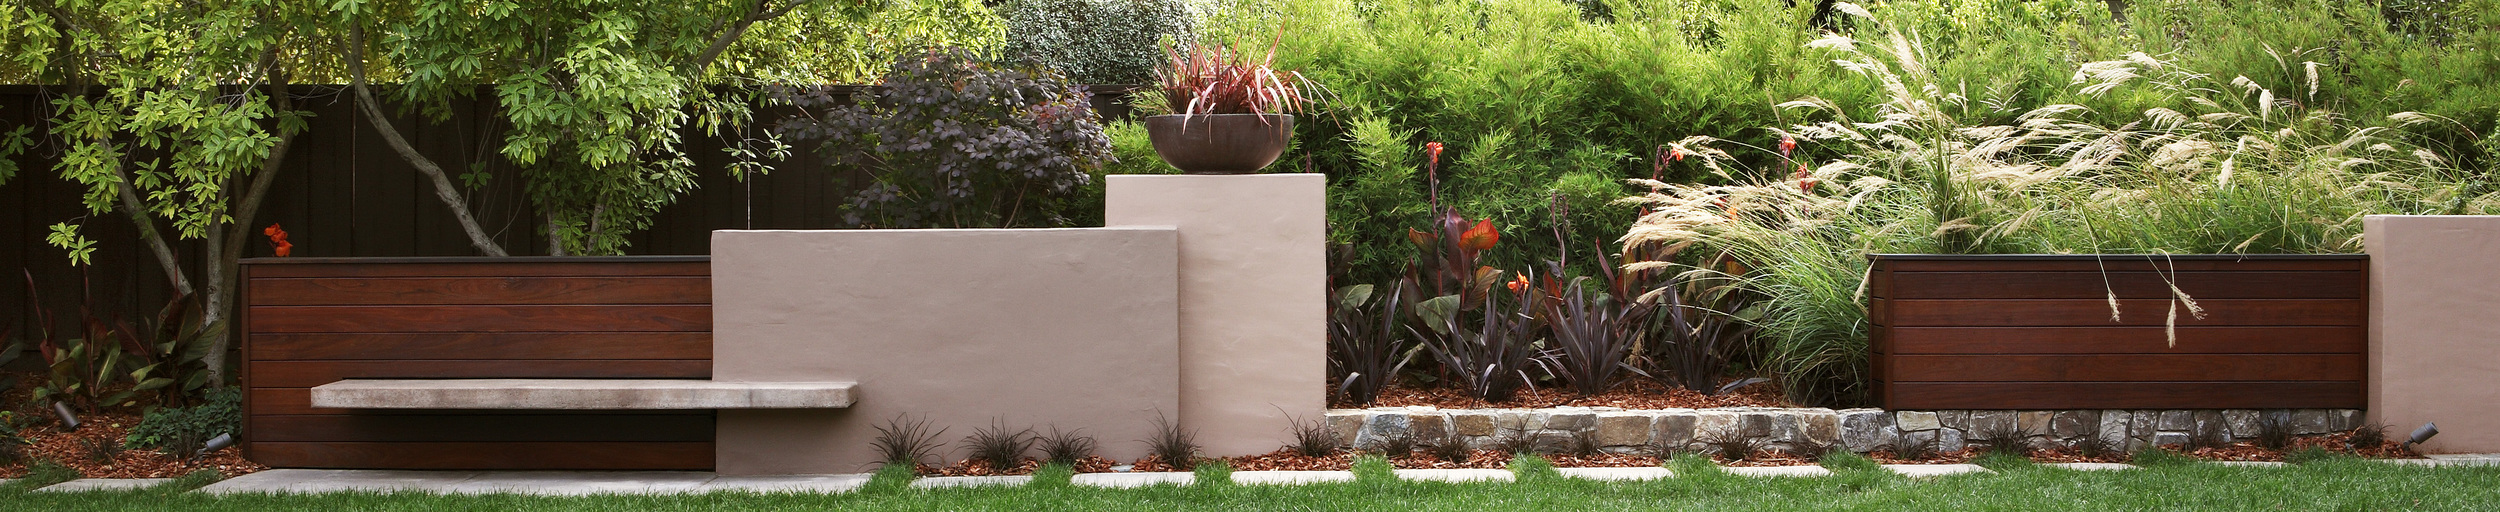 Garden as Sculpture by Arterra Landscape Architects.Photo by Michele Lee Willson